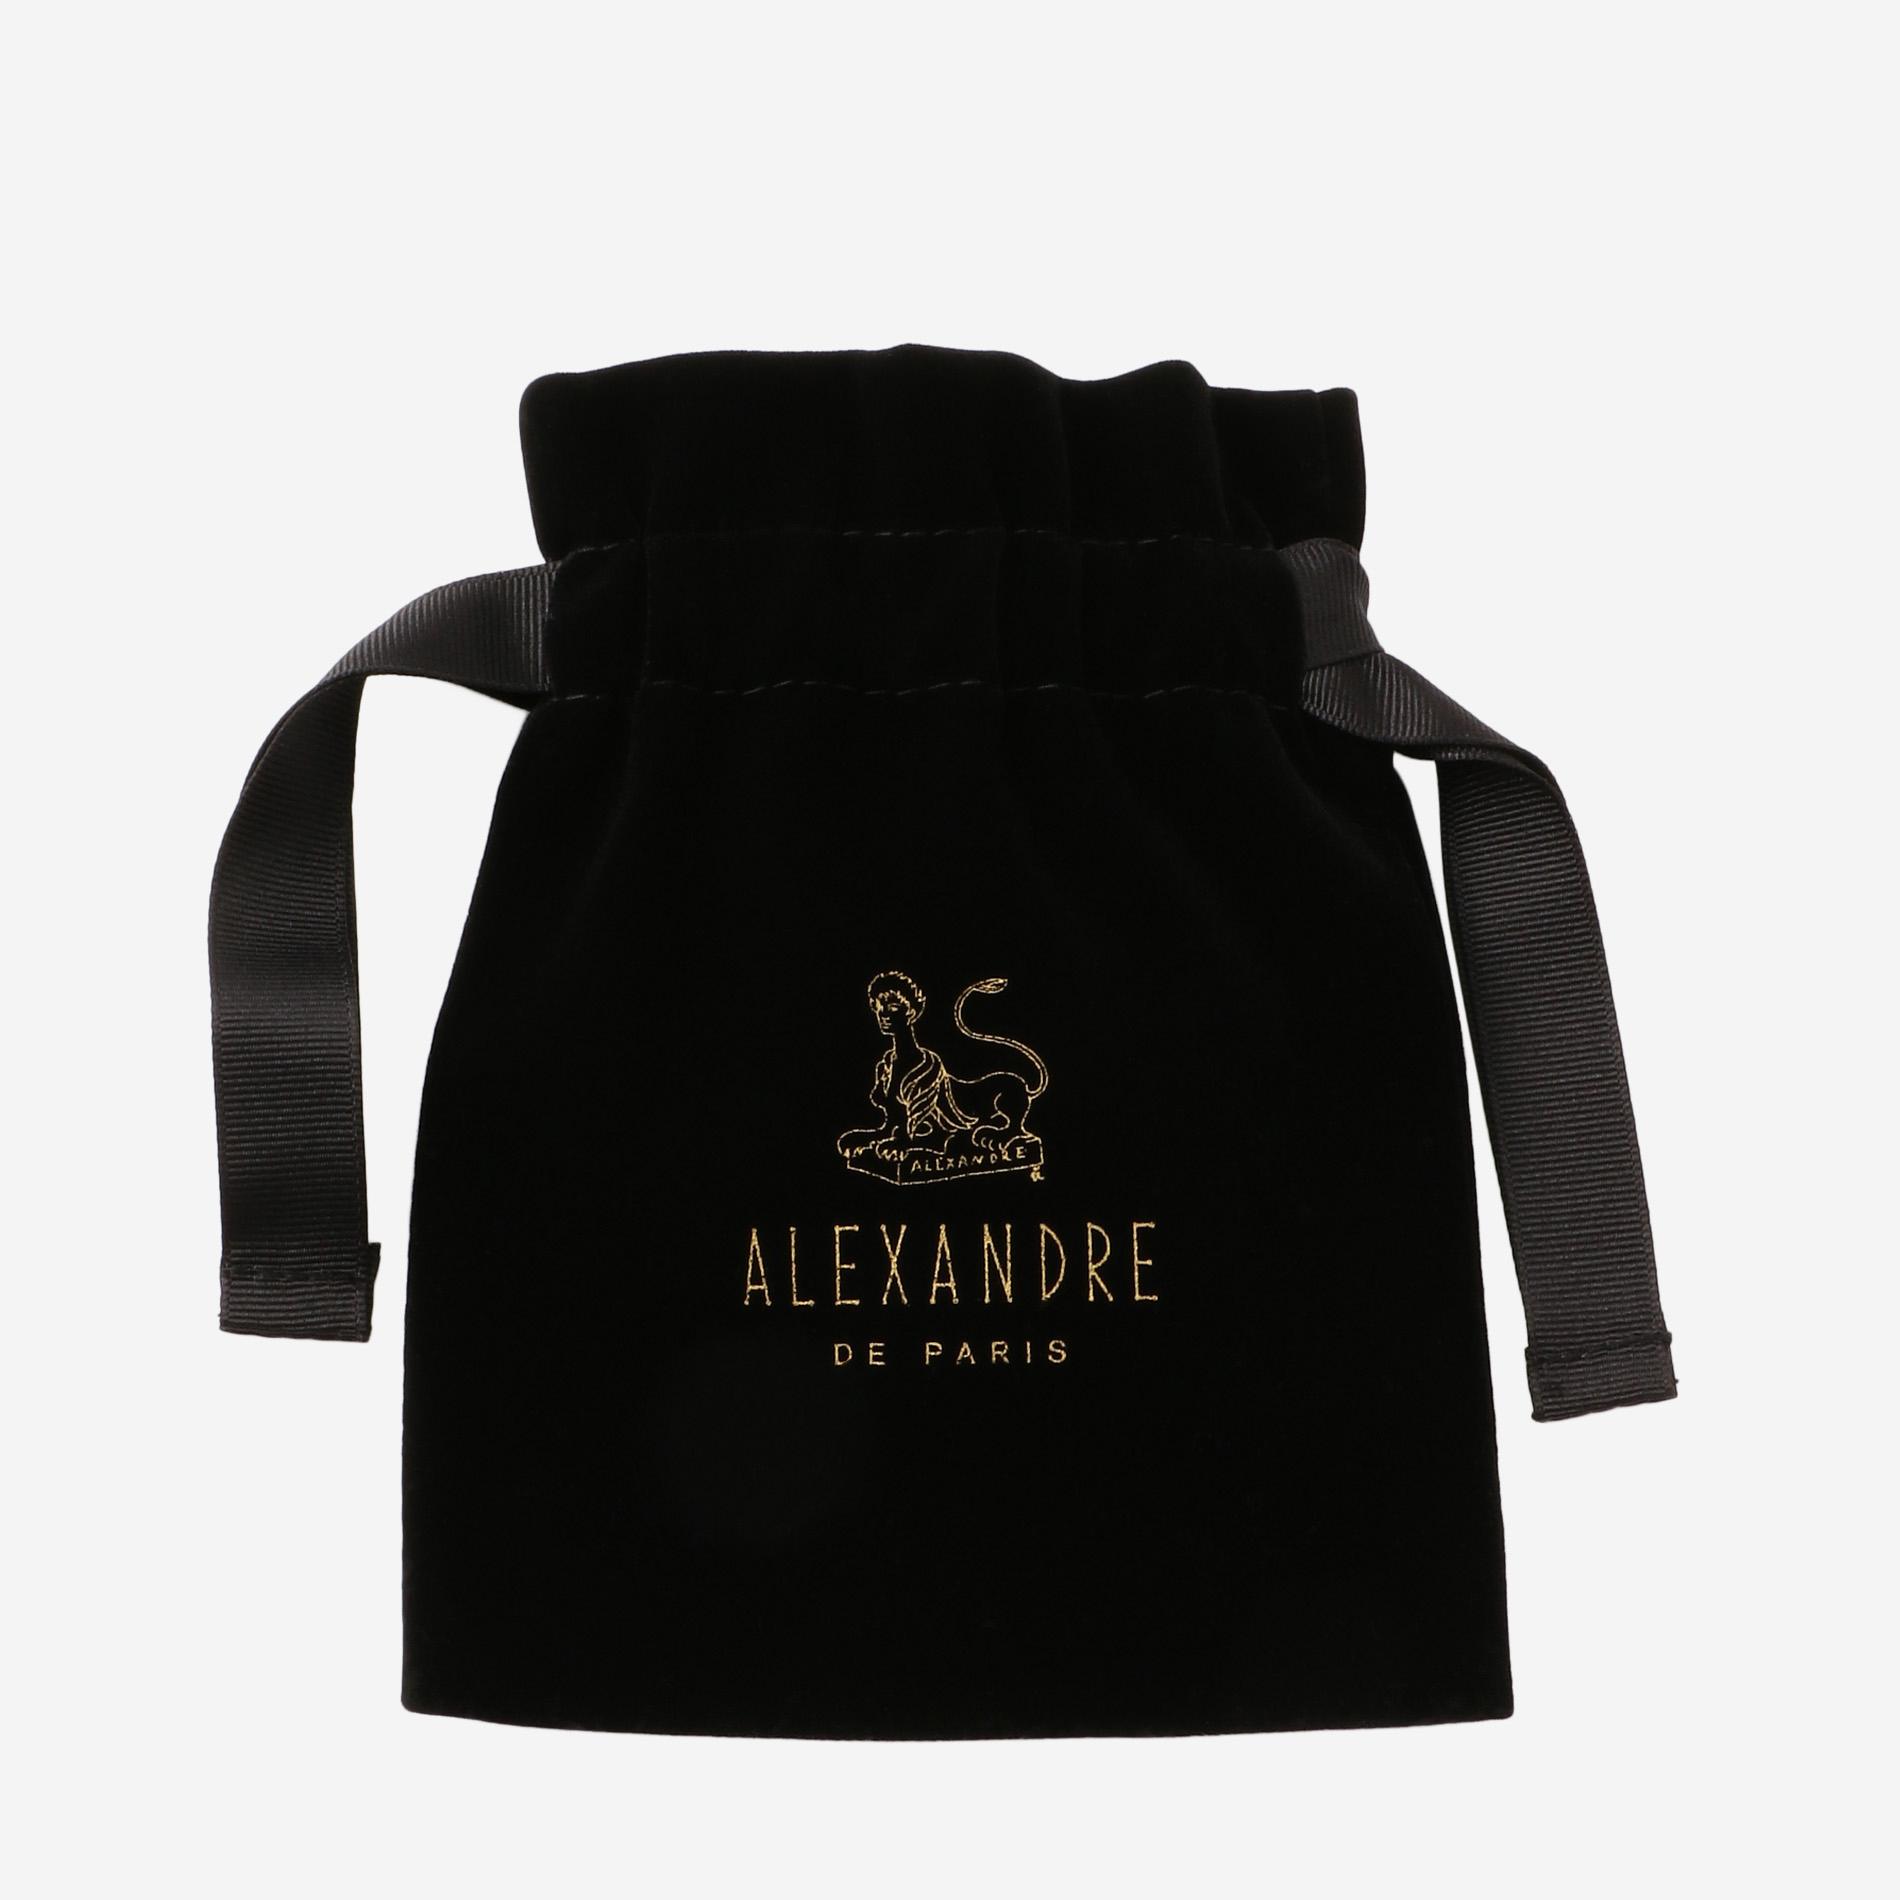 ◆◆【ALEXANDRE DE PARIS】リボンバレッタ(ブラウン)